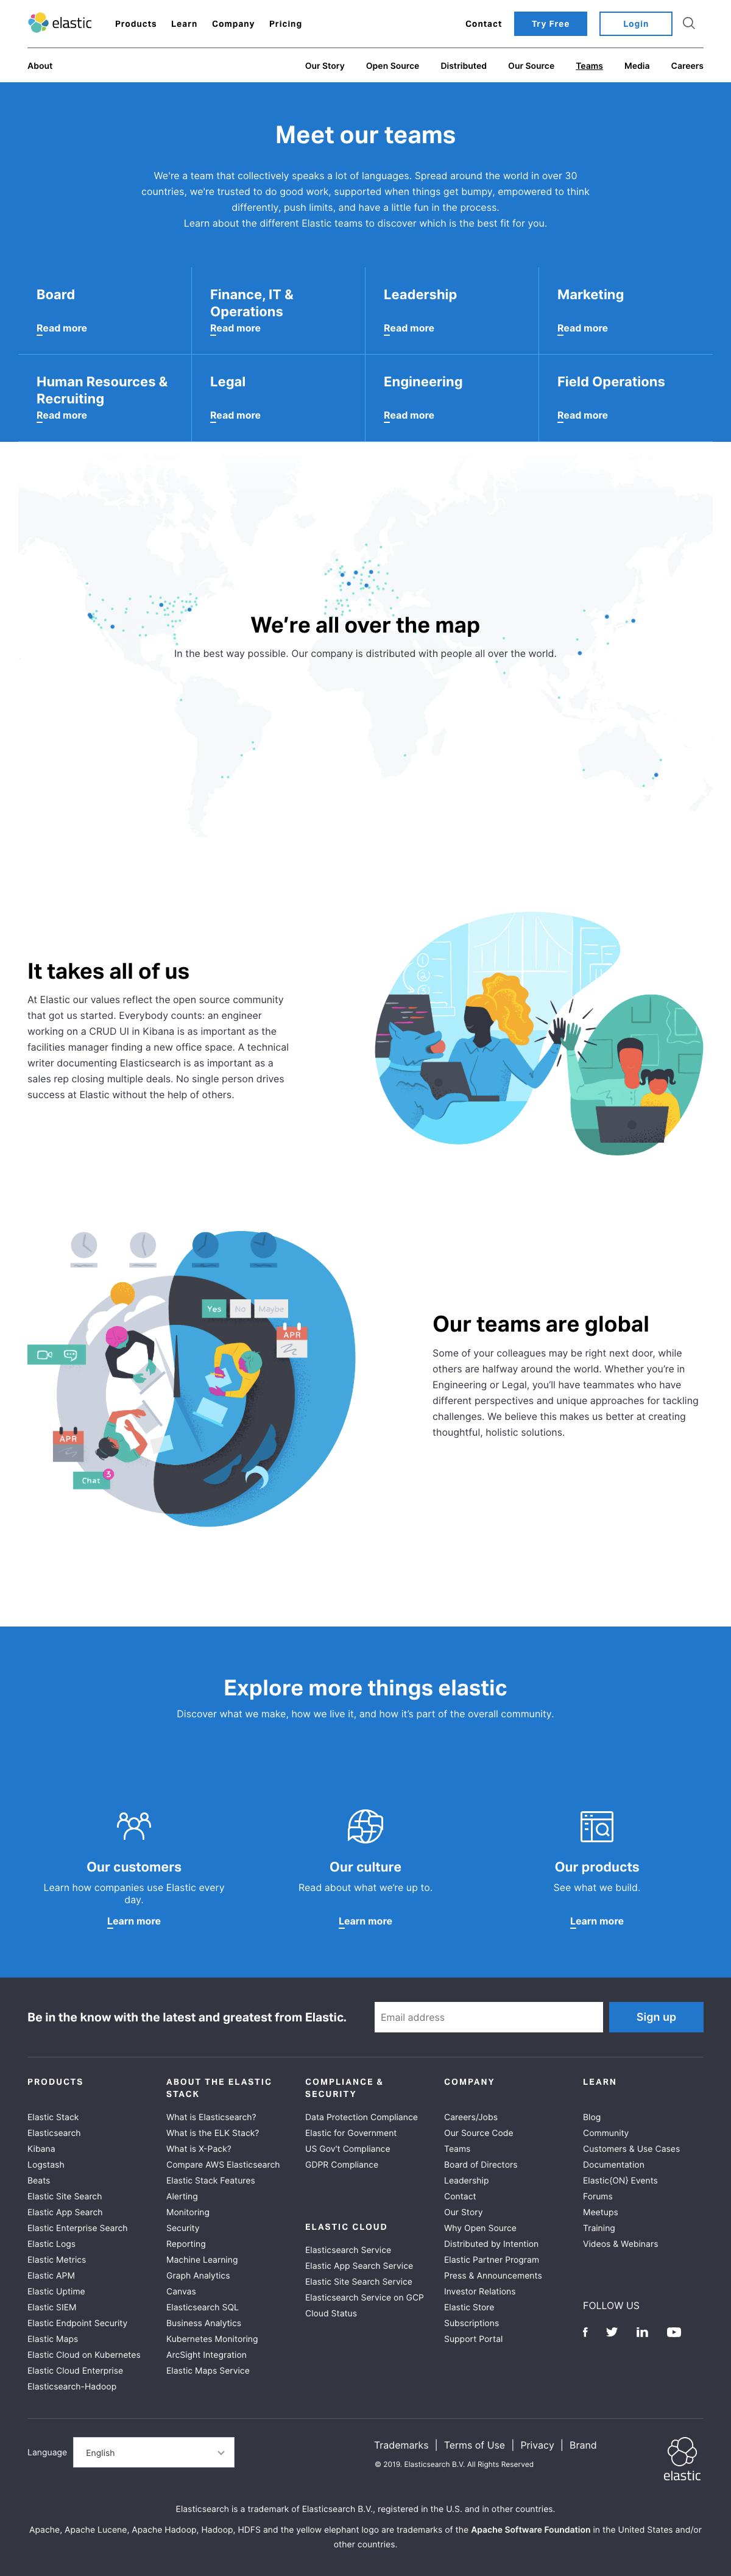 Elastic - Team page